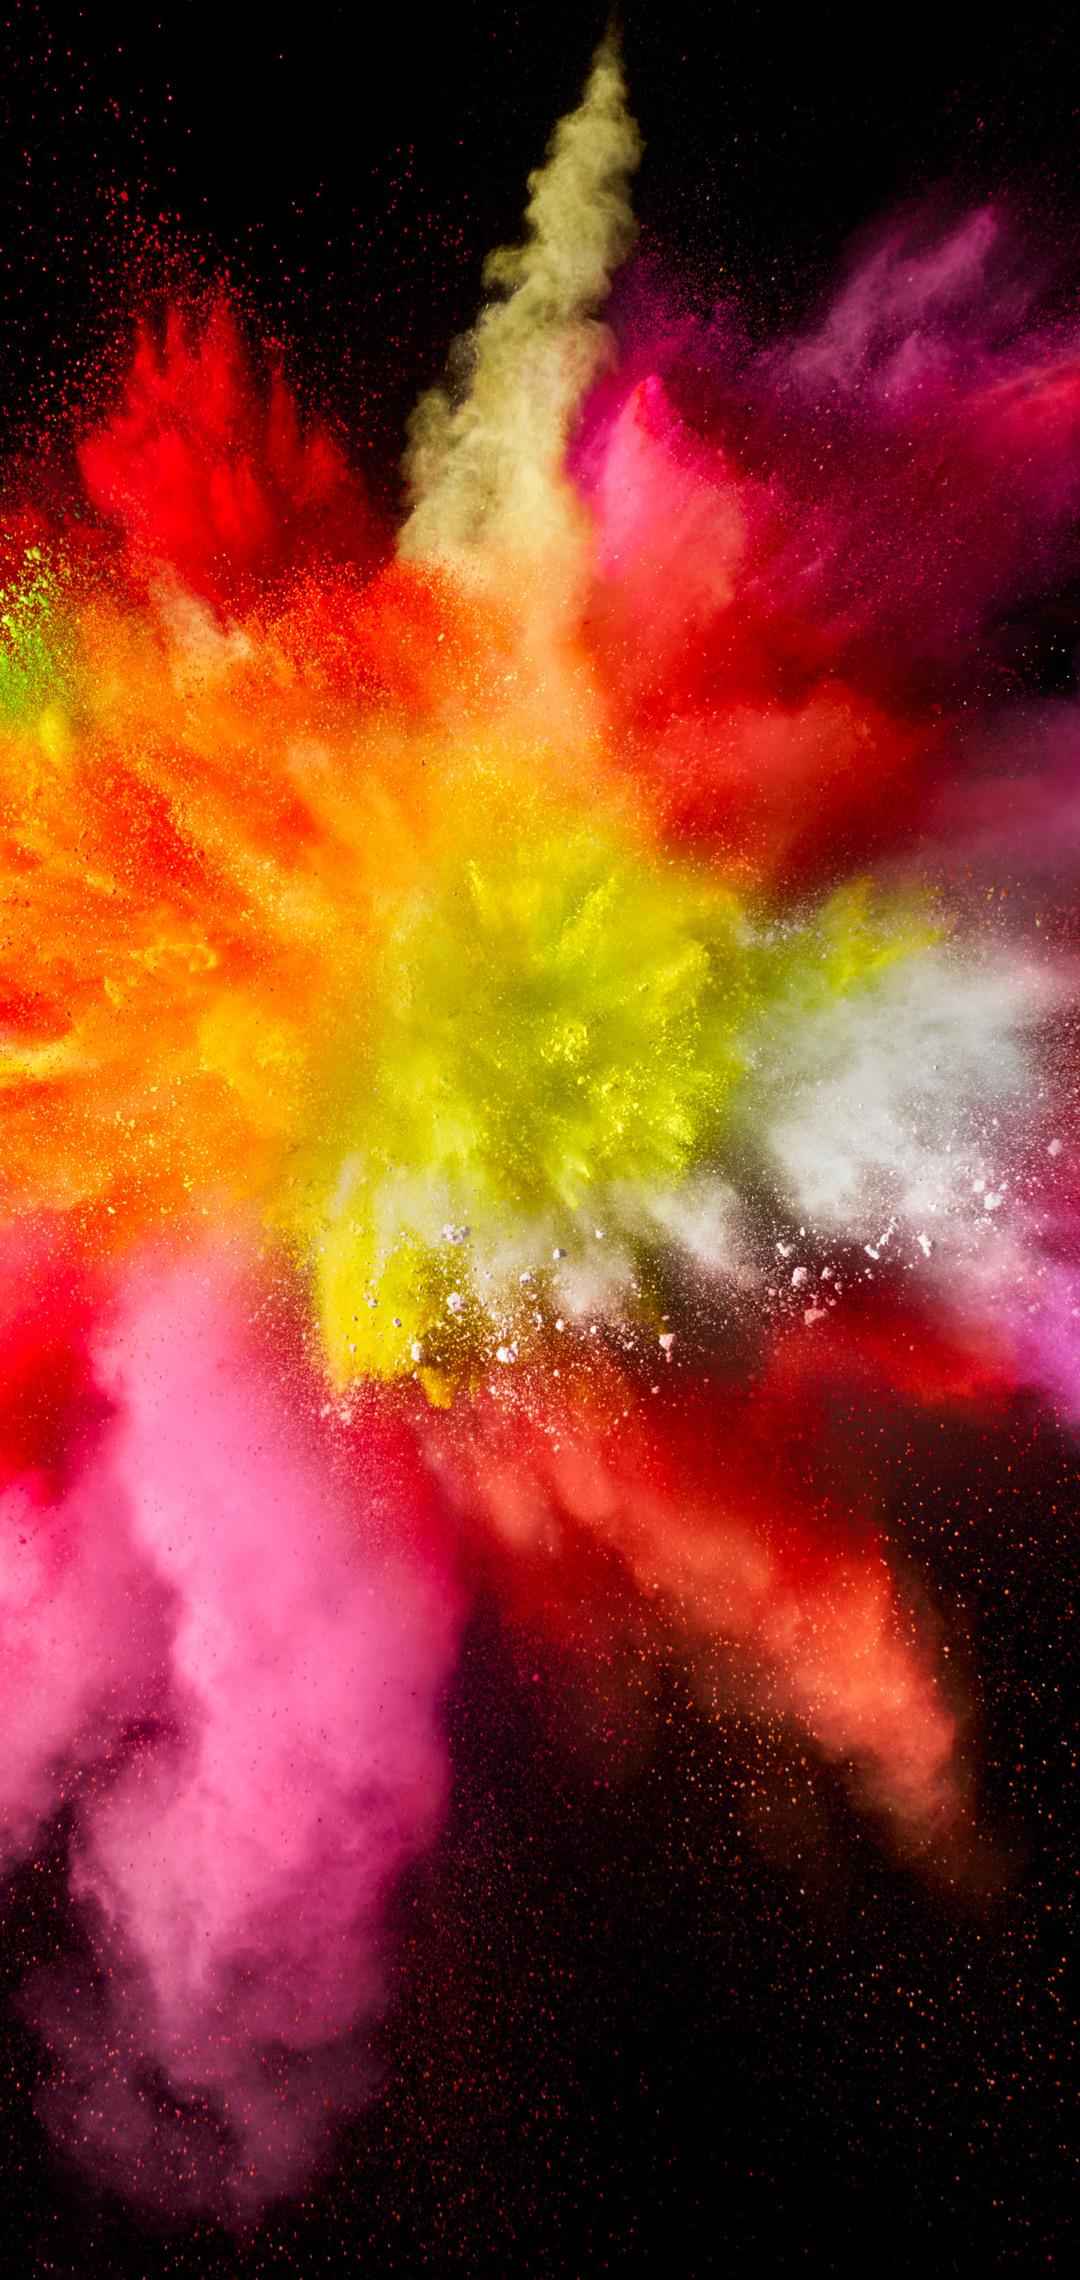 mac-os-sierra-color-splash-red-stock-pic.jpg